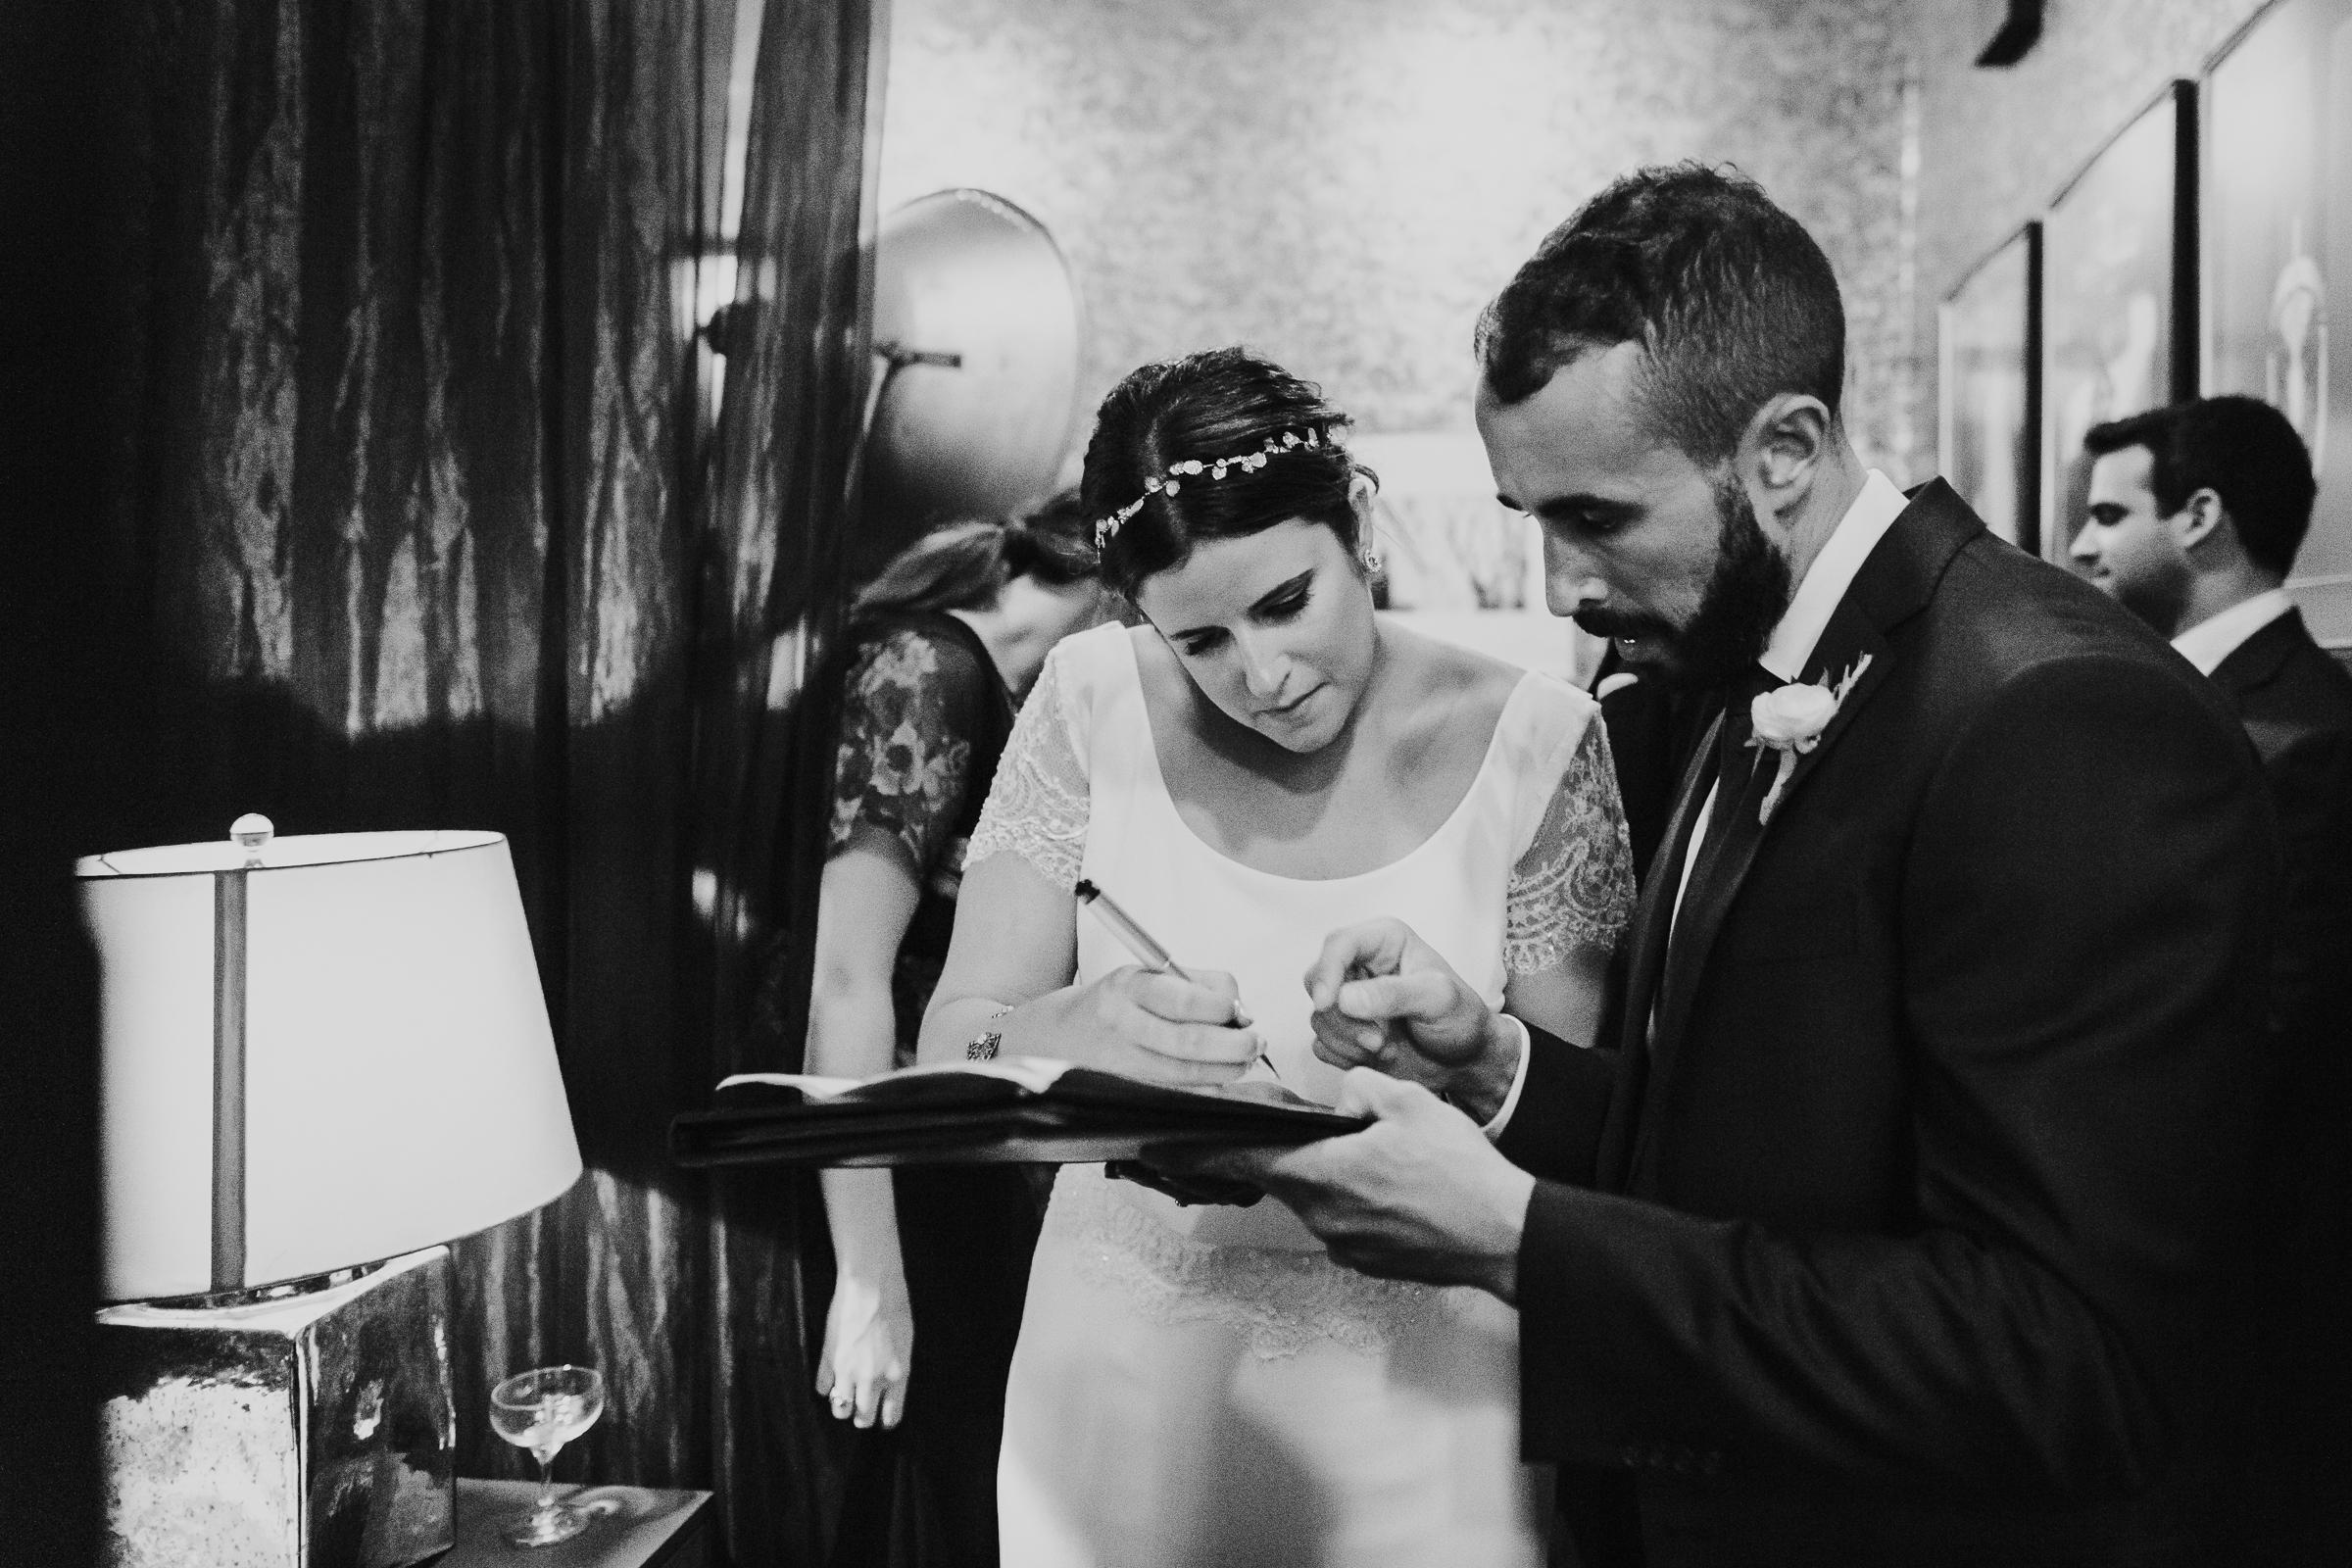 501-Union-Brooklyn-Fine-Art-Documentary-Wedding-Photographer-67.jpg